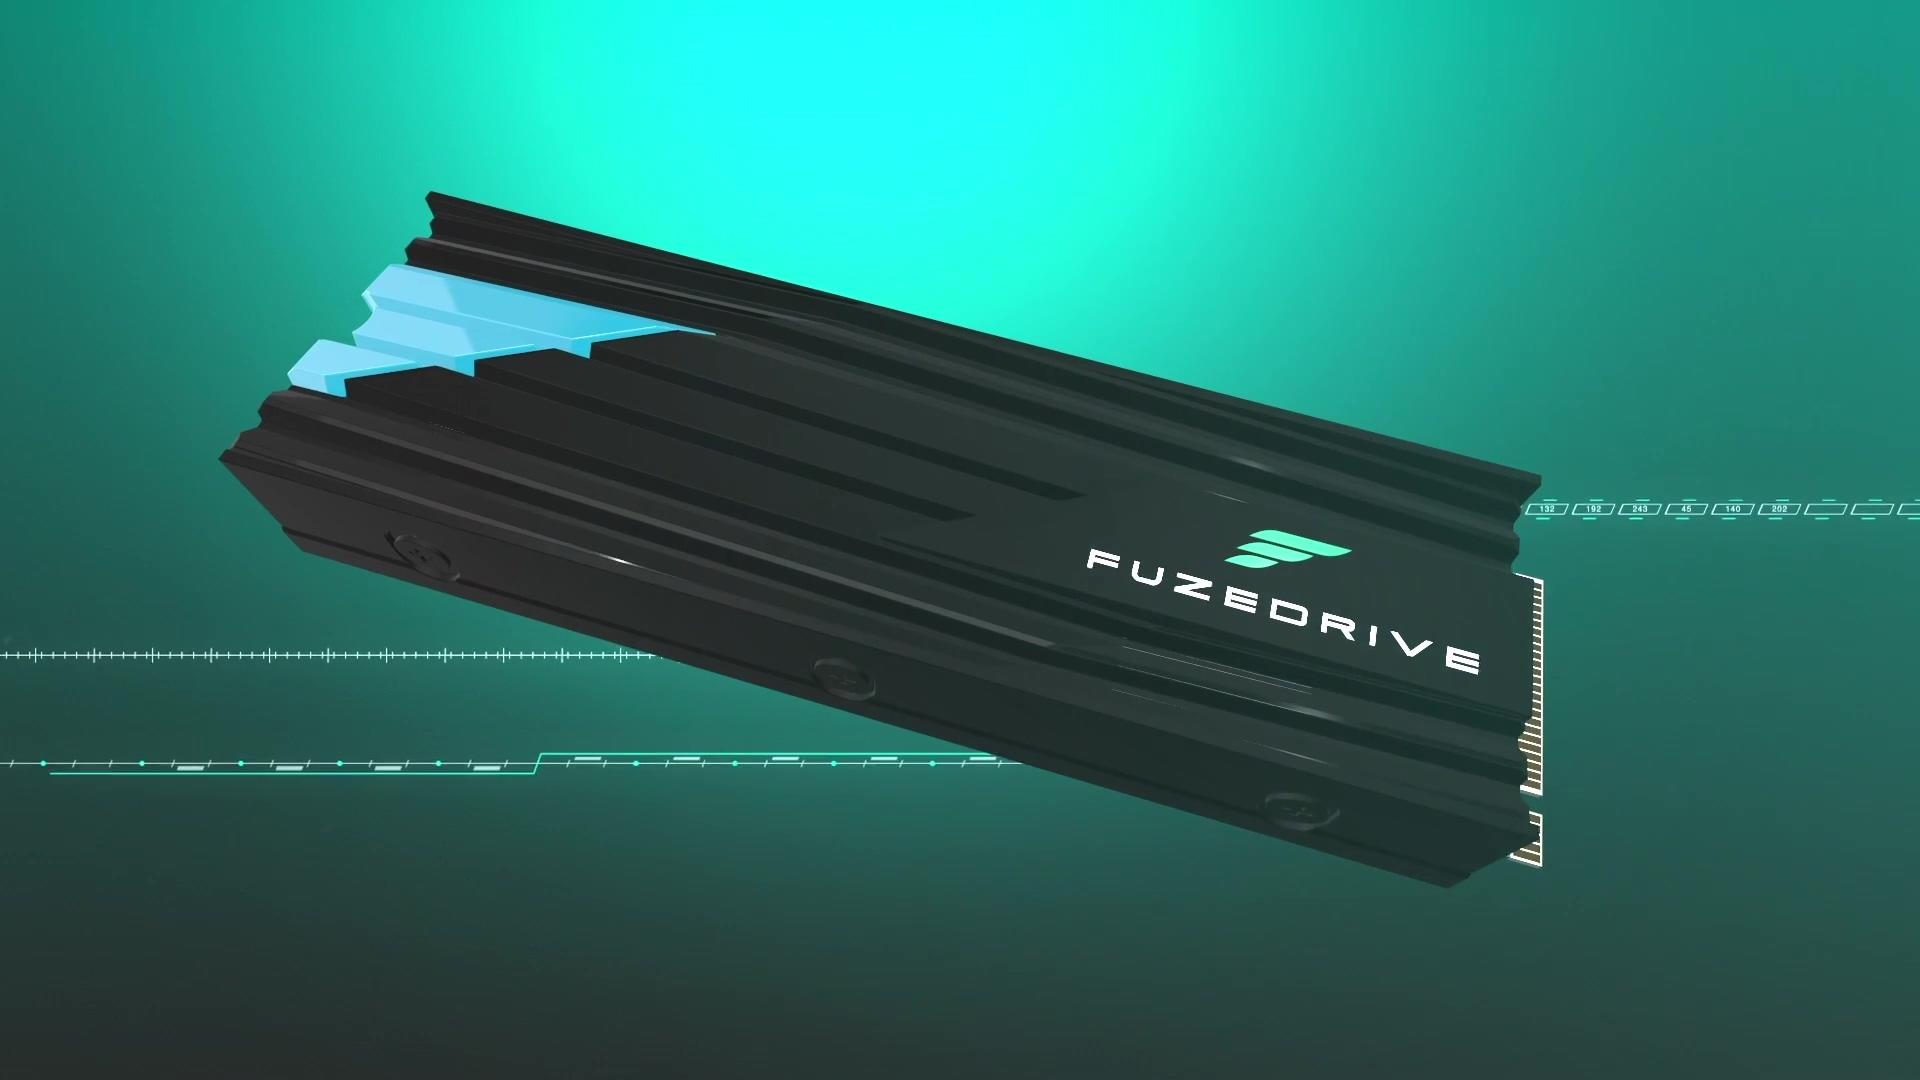 FuzeDrive-Roughcut-2020-09-21 - NEW GFX